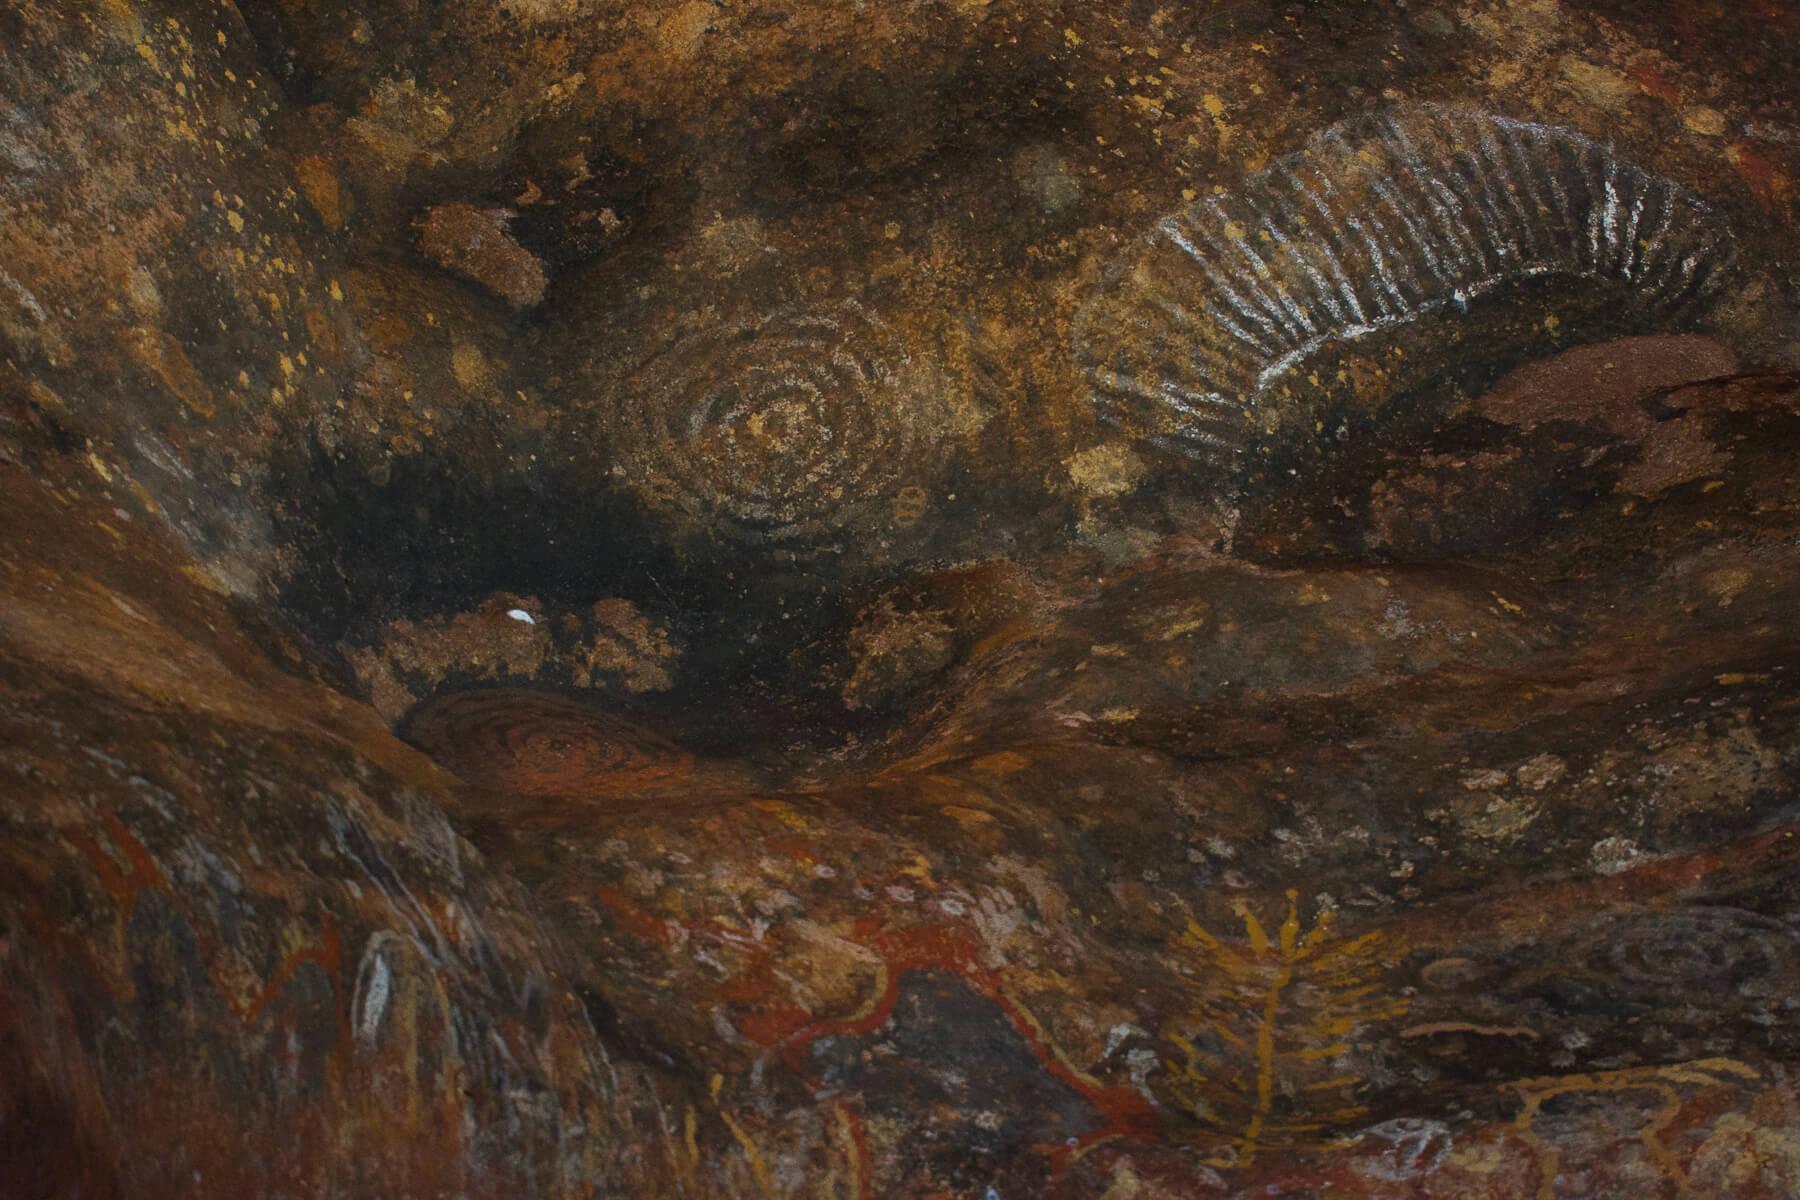 Aboriginal Paintings inside a cave of Uluru